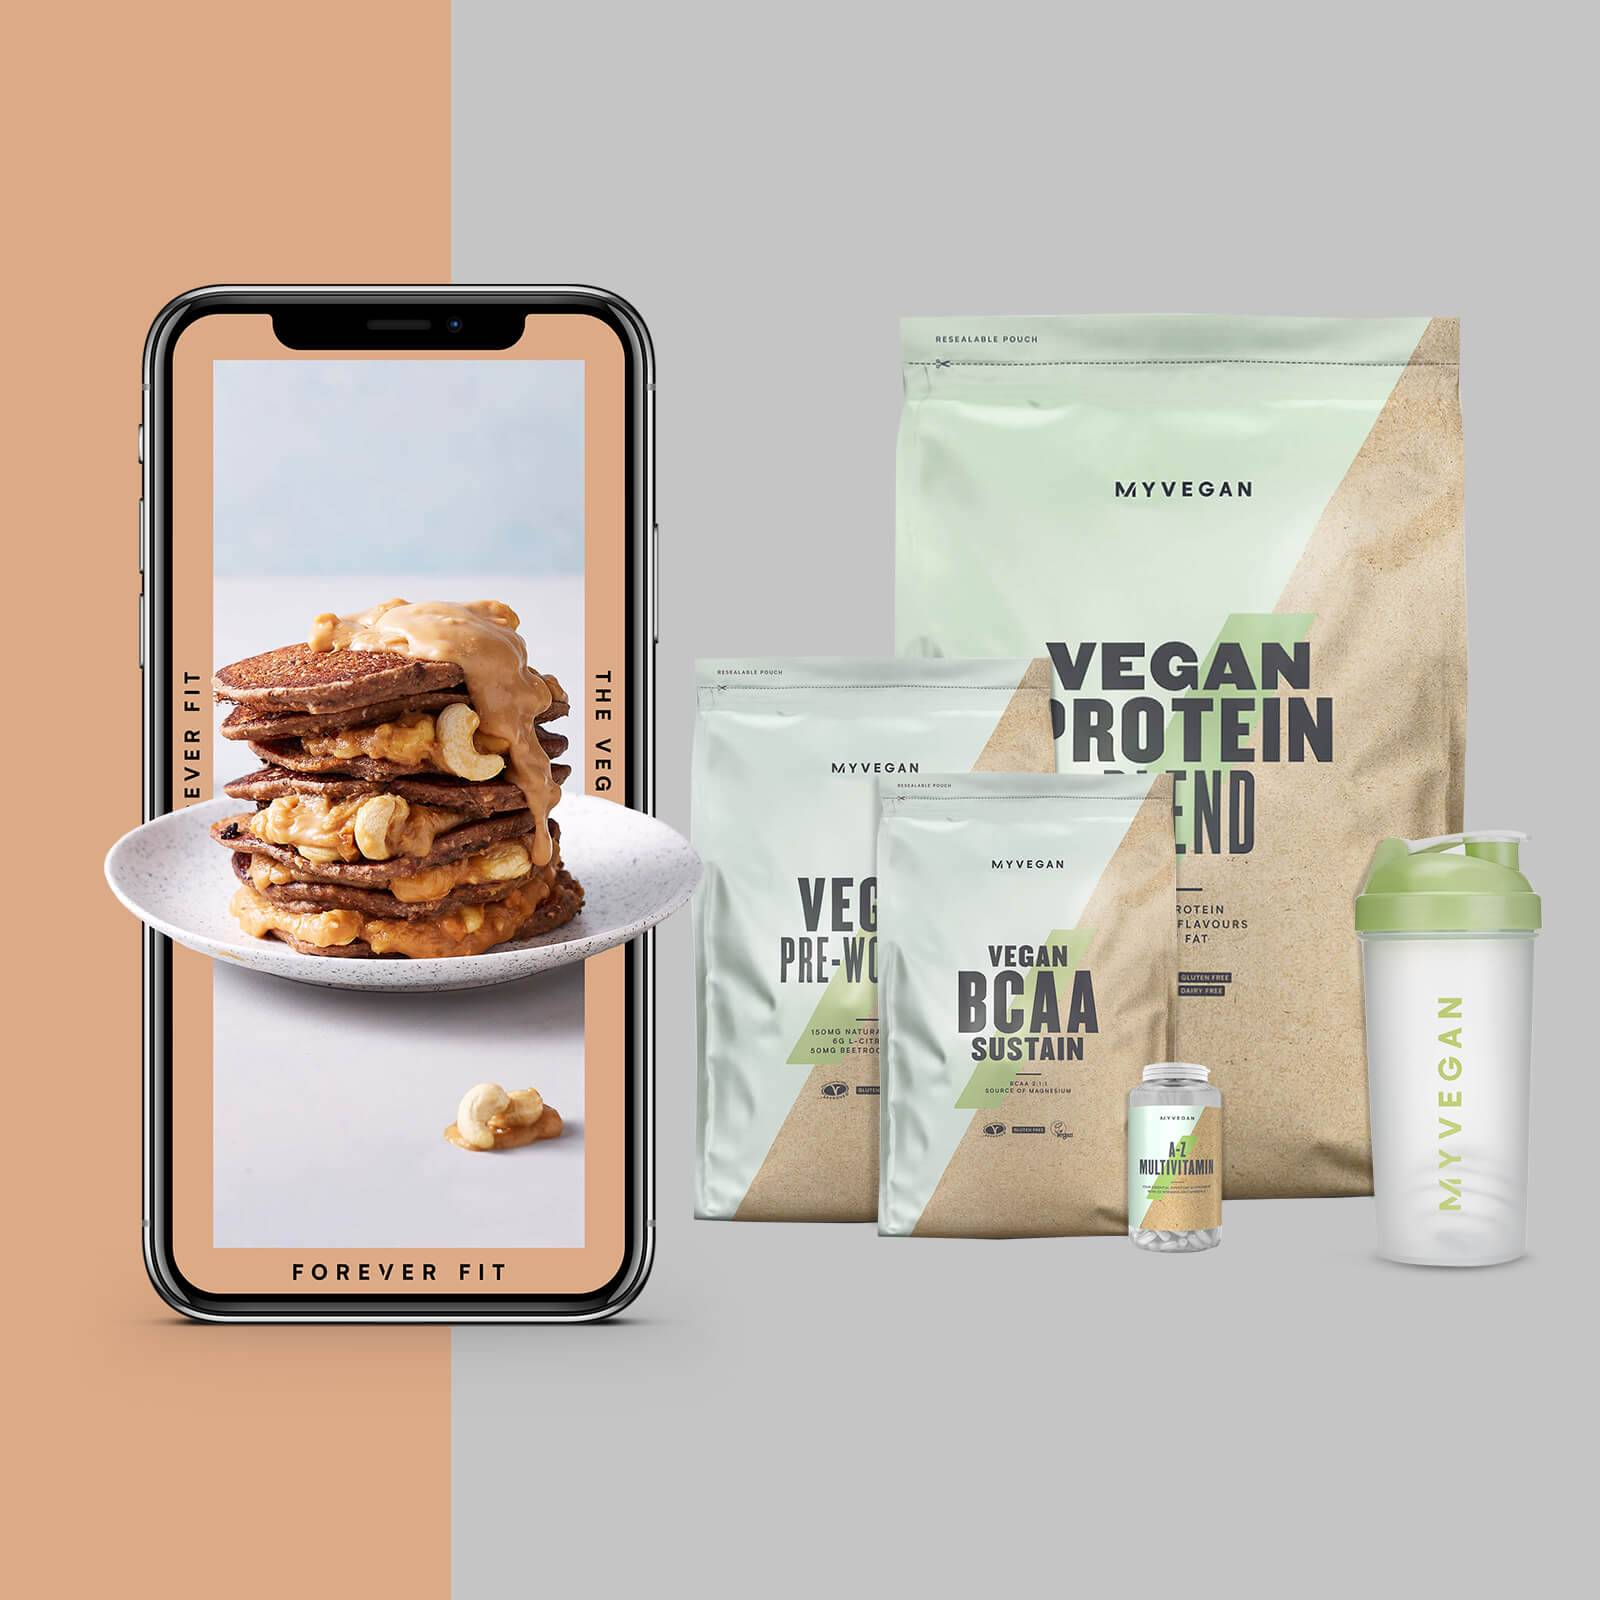 Le Pack Vegan + Guide Entraînement et Nutrition Offert - Raspberry Lemonade - Sour Apple - Coffee and Walnut